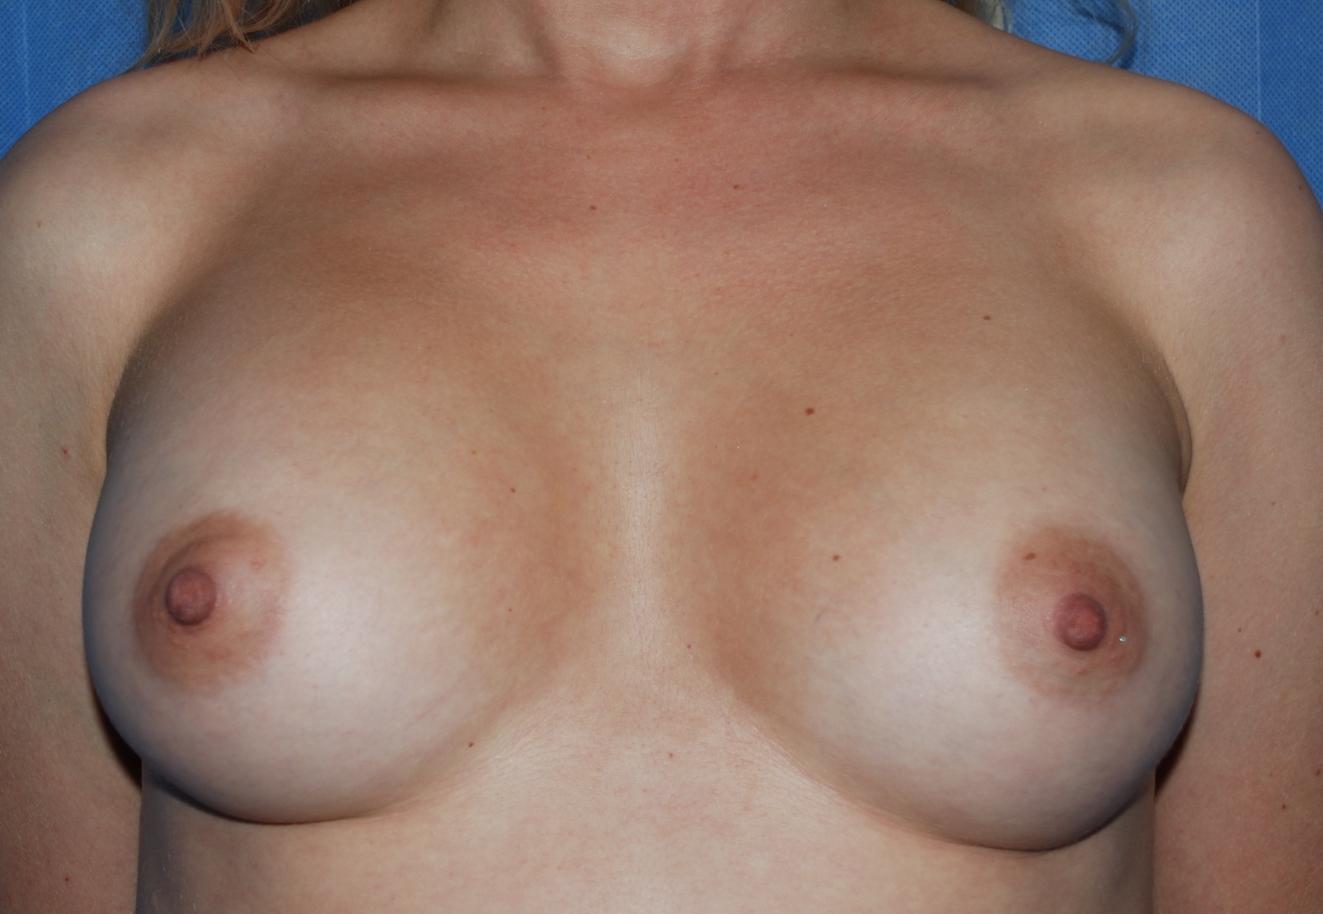 Breast enlargement near brighton oliver harley